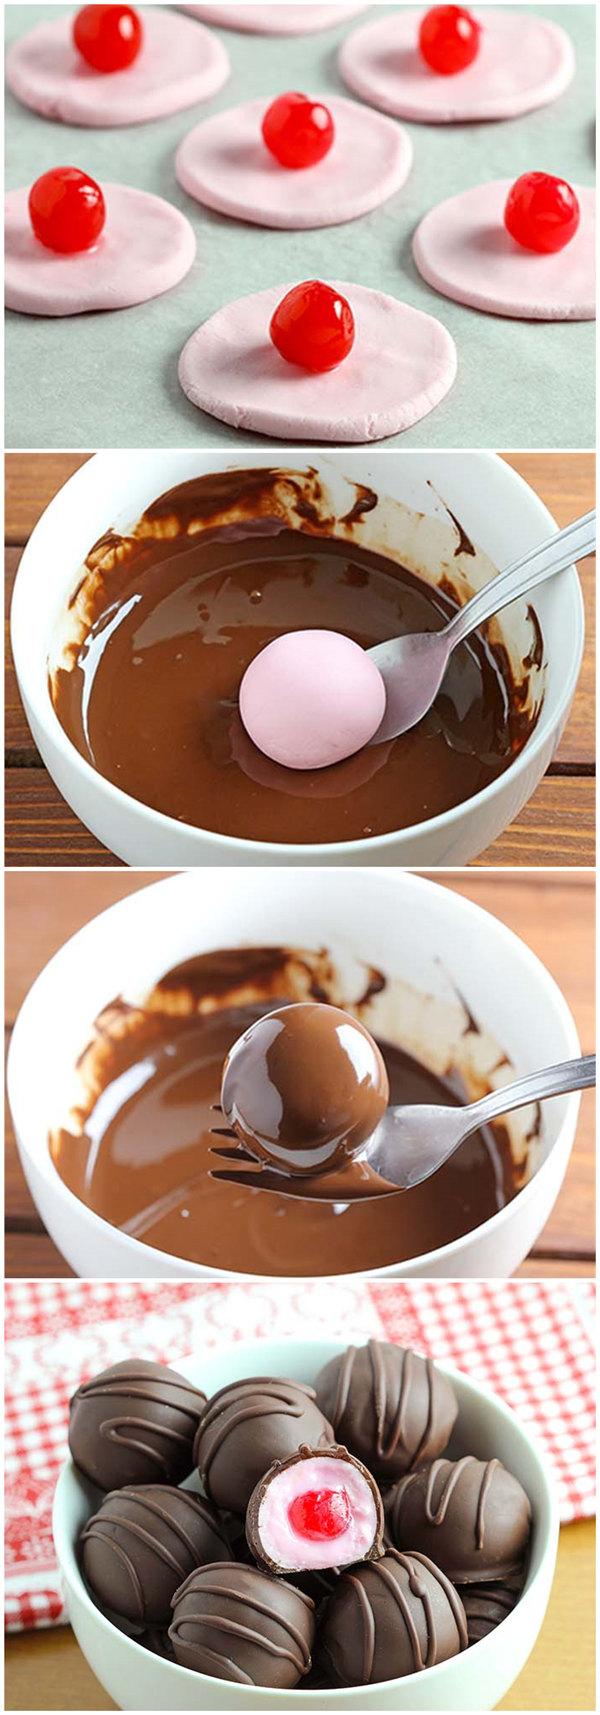 Easy Chocolate Covered Cherries